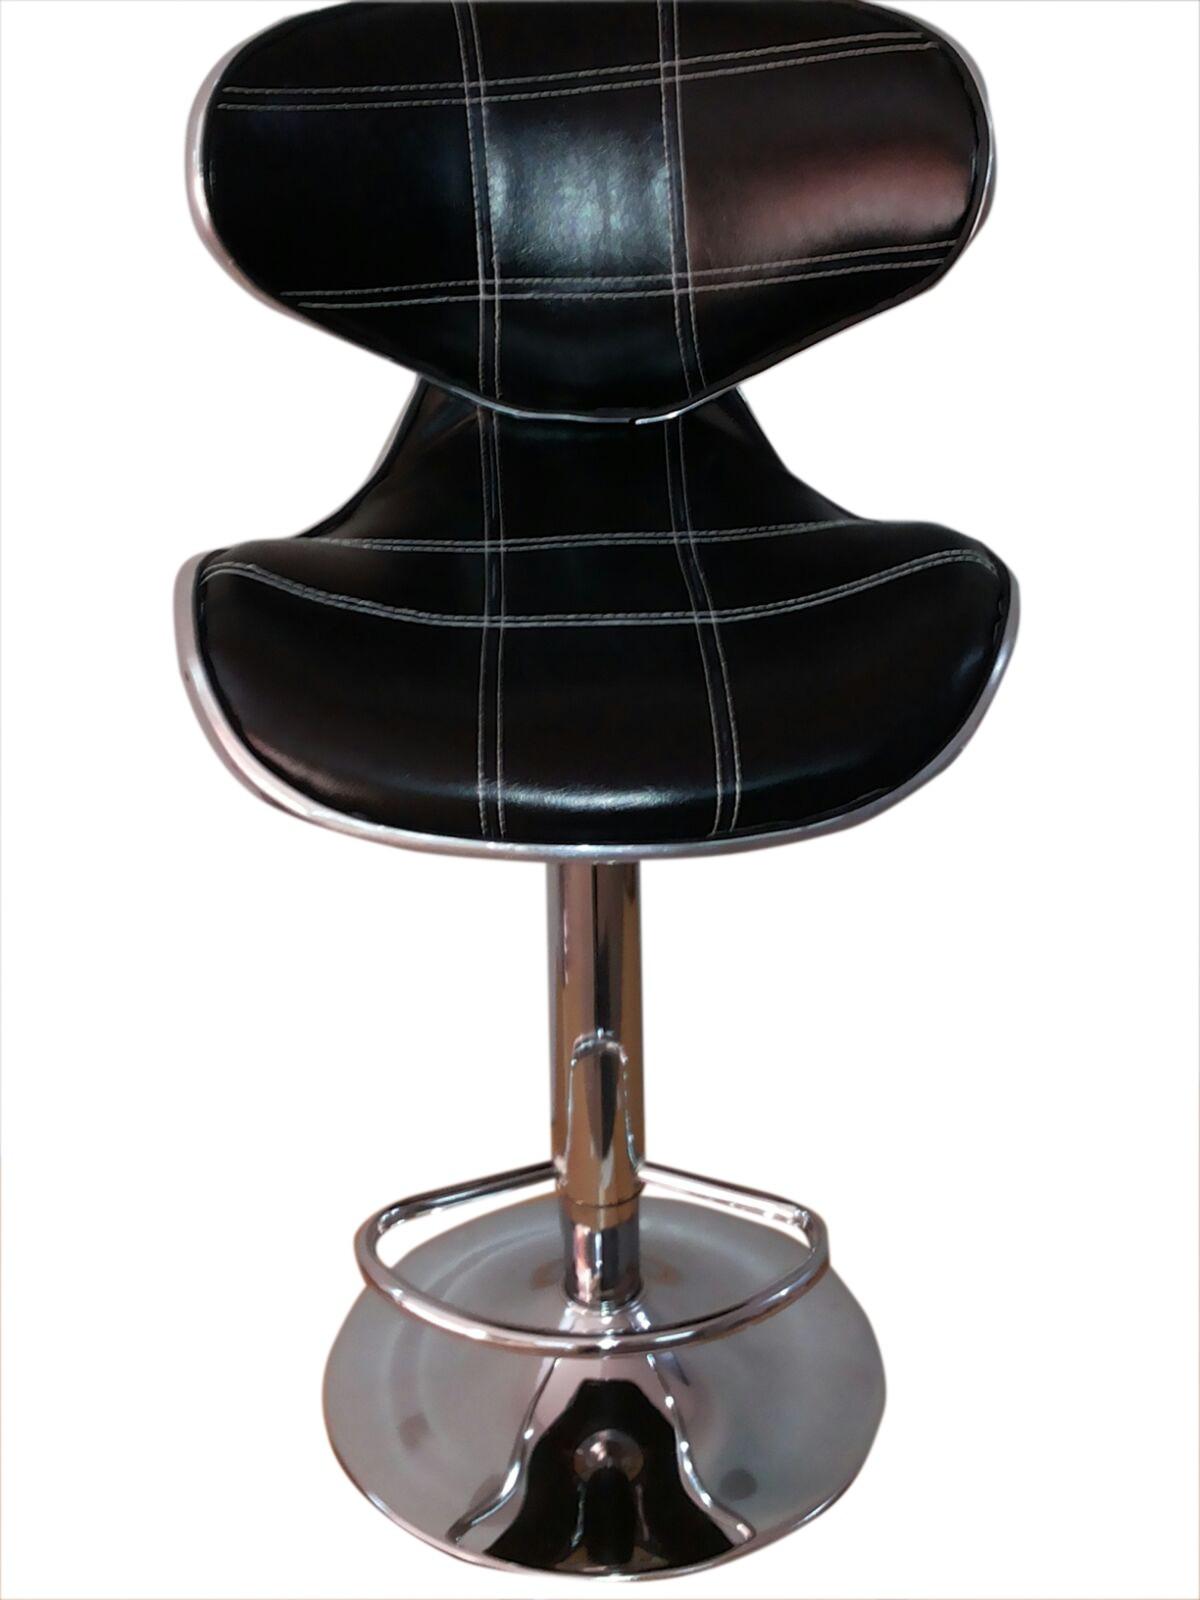 Furniture First Kenzo Half-leather Bar Chair